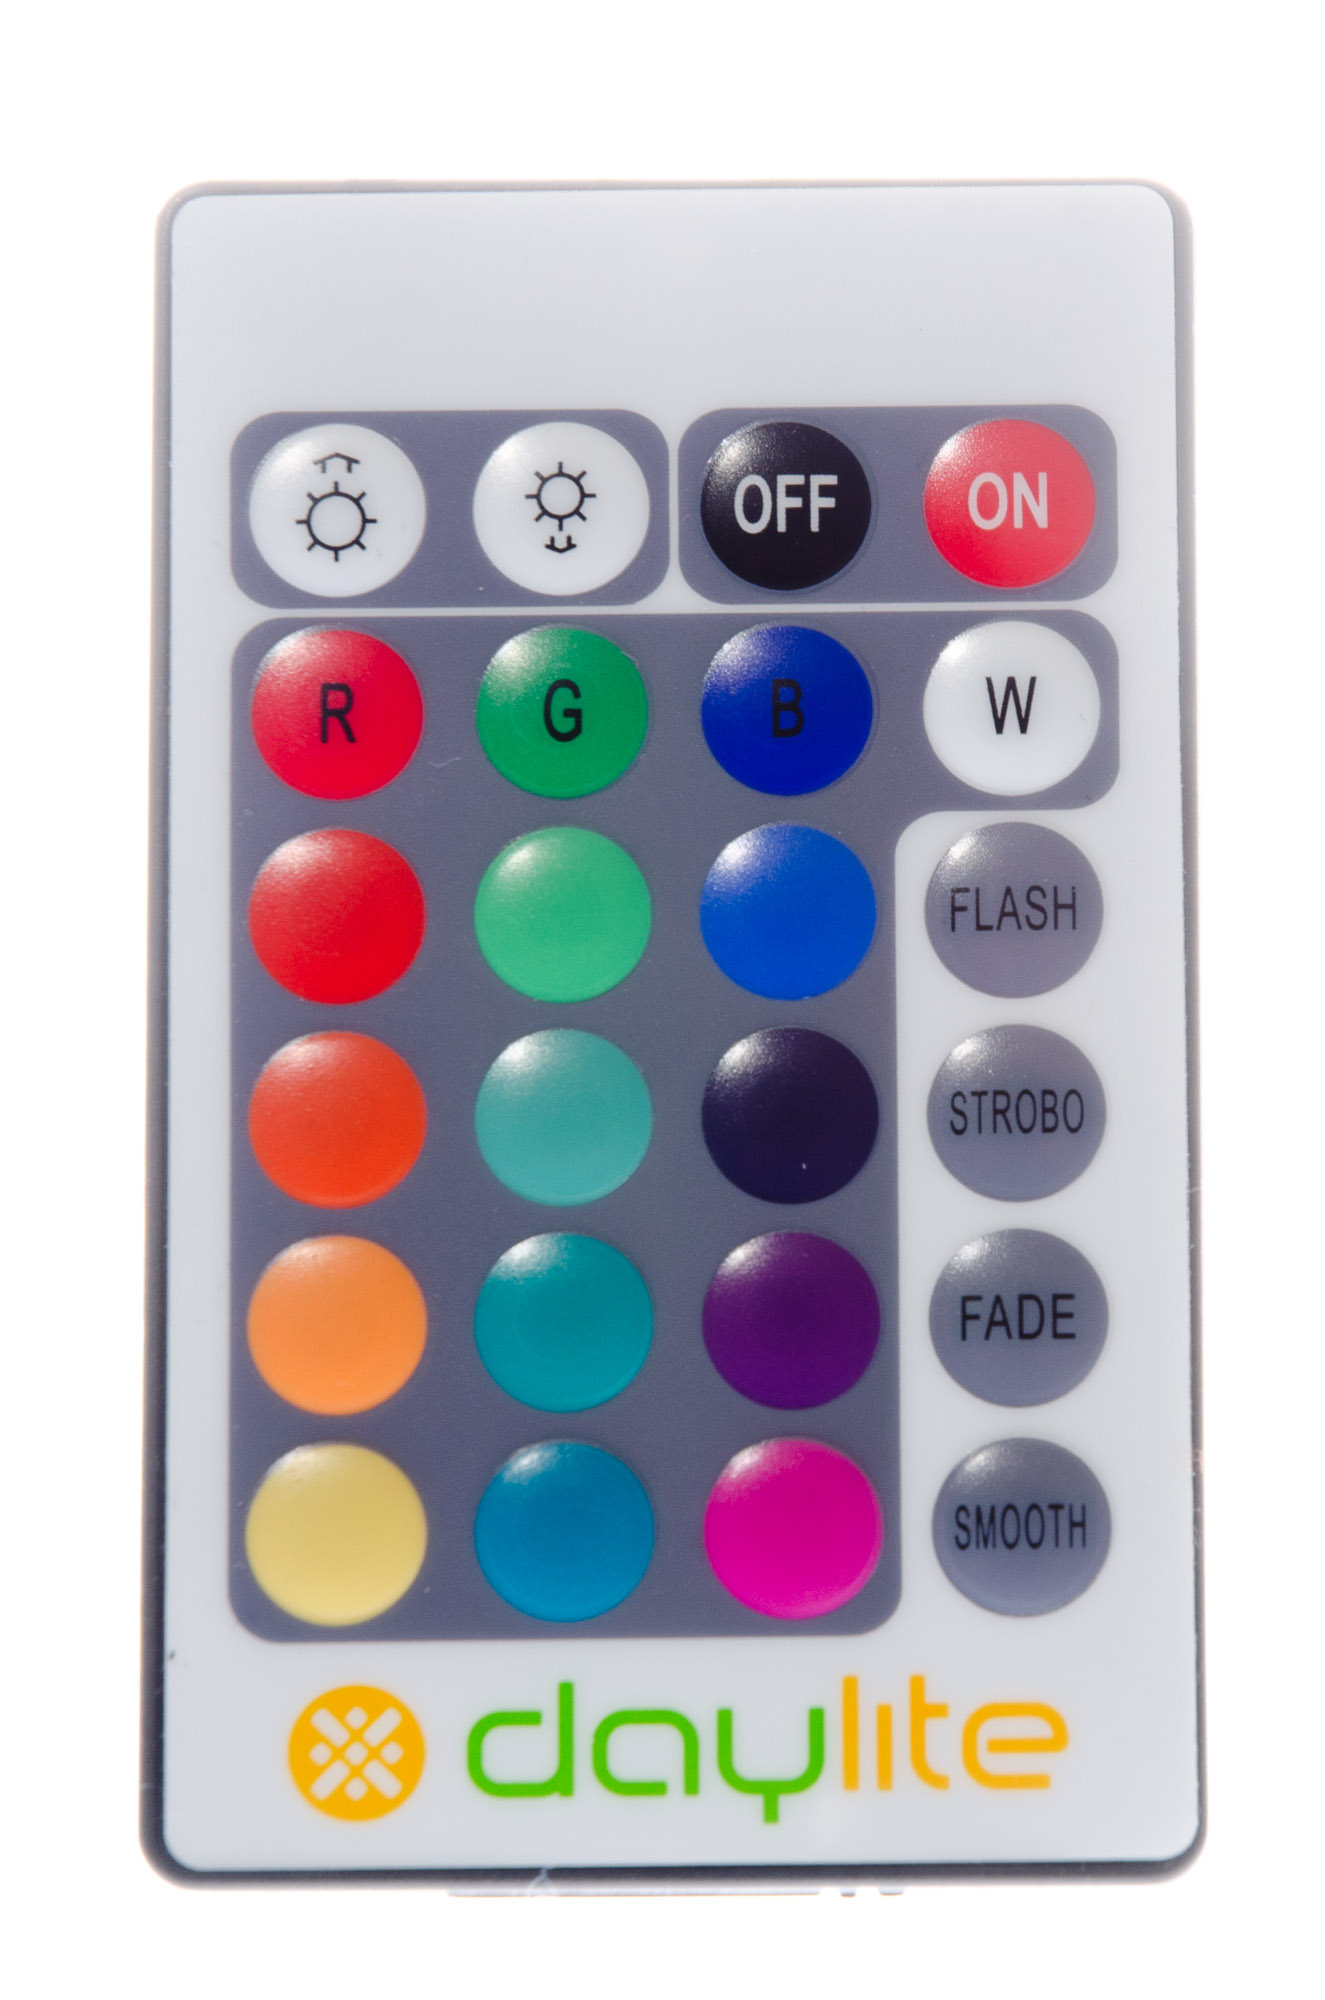 daylite RGB strip remote controller